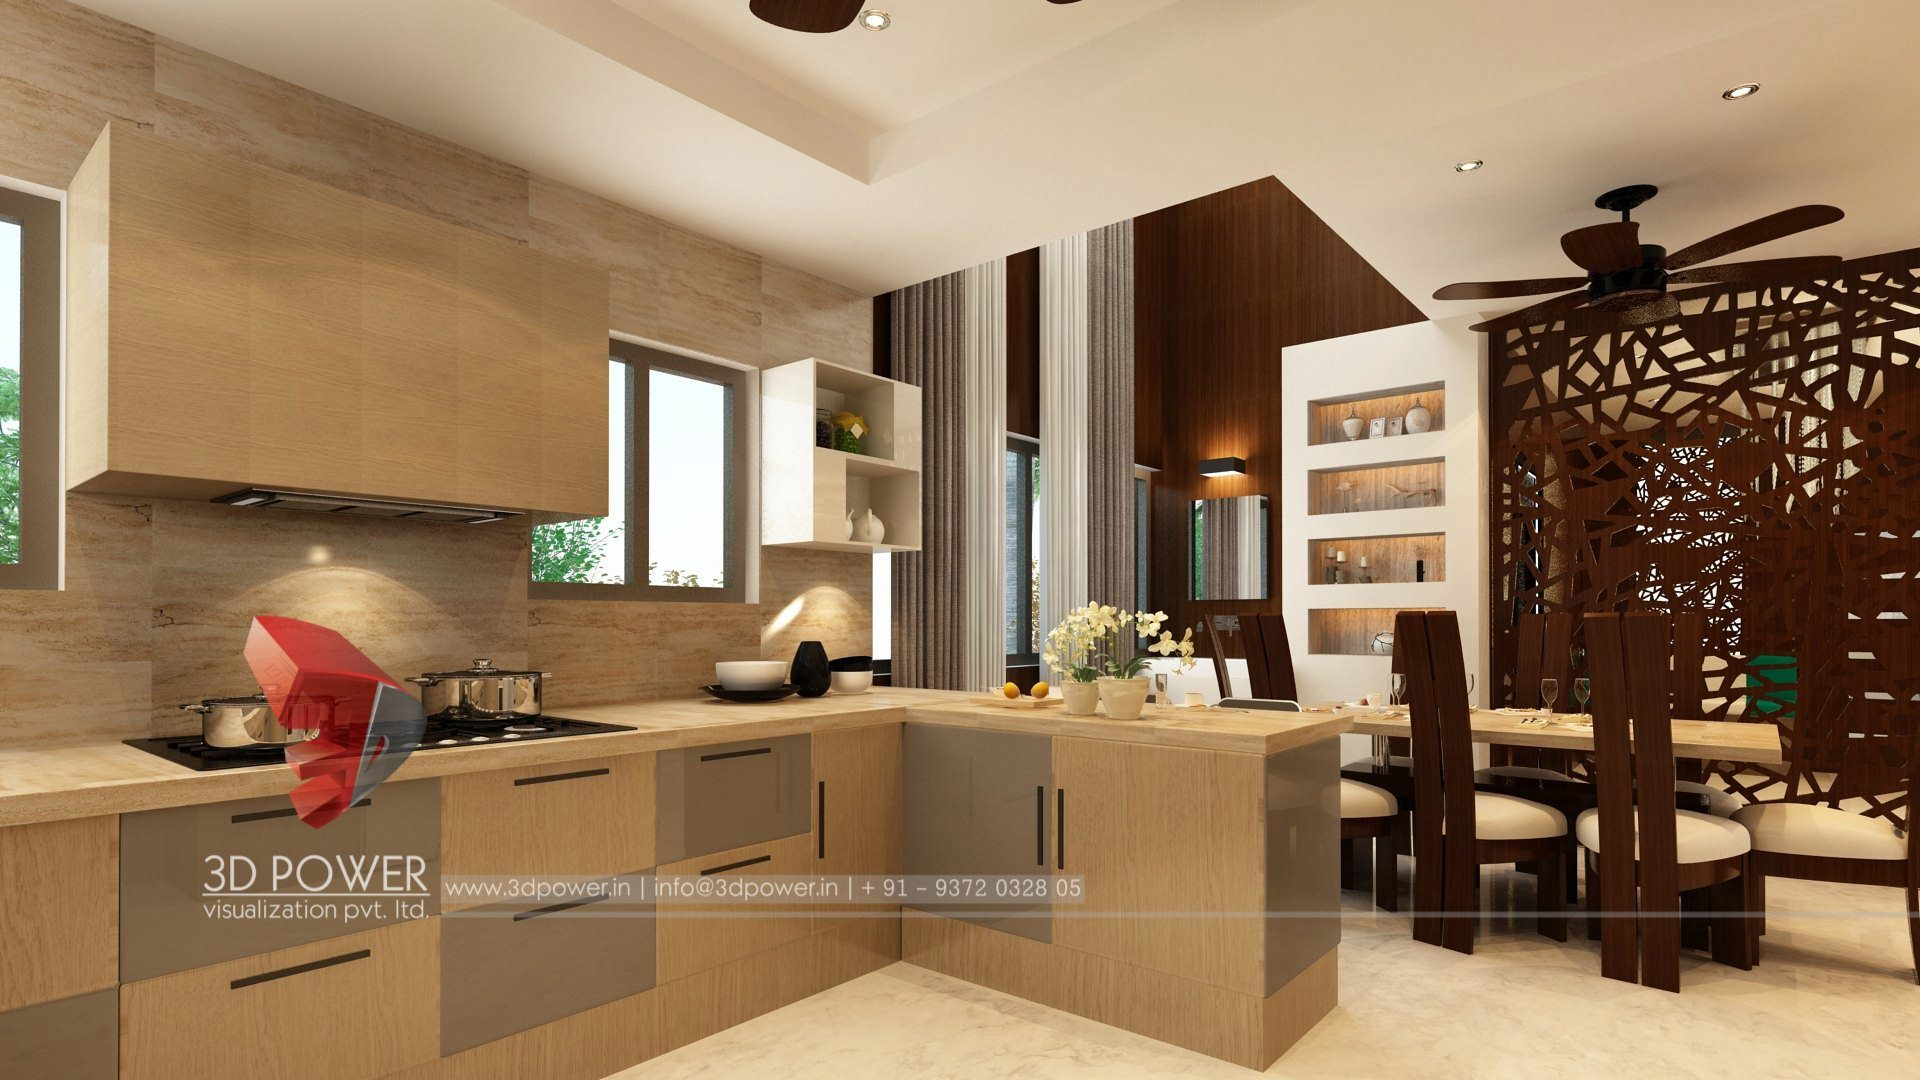 3D Interior Design & Rendering Services  Bungalow & Home Interior Design  3D Power